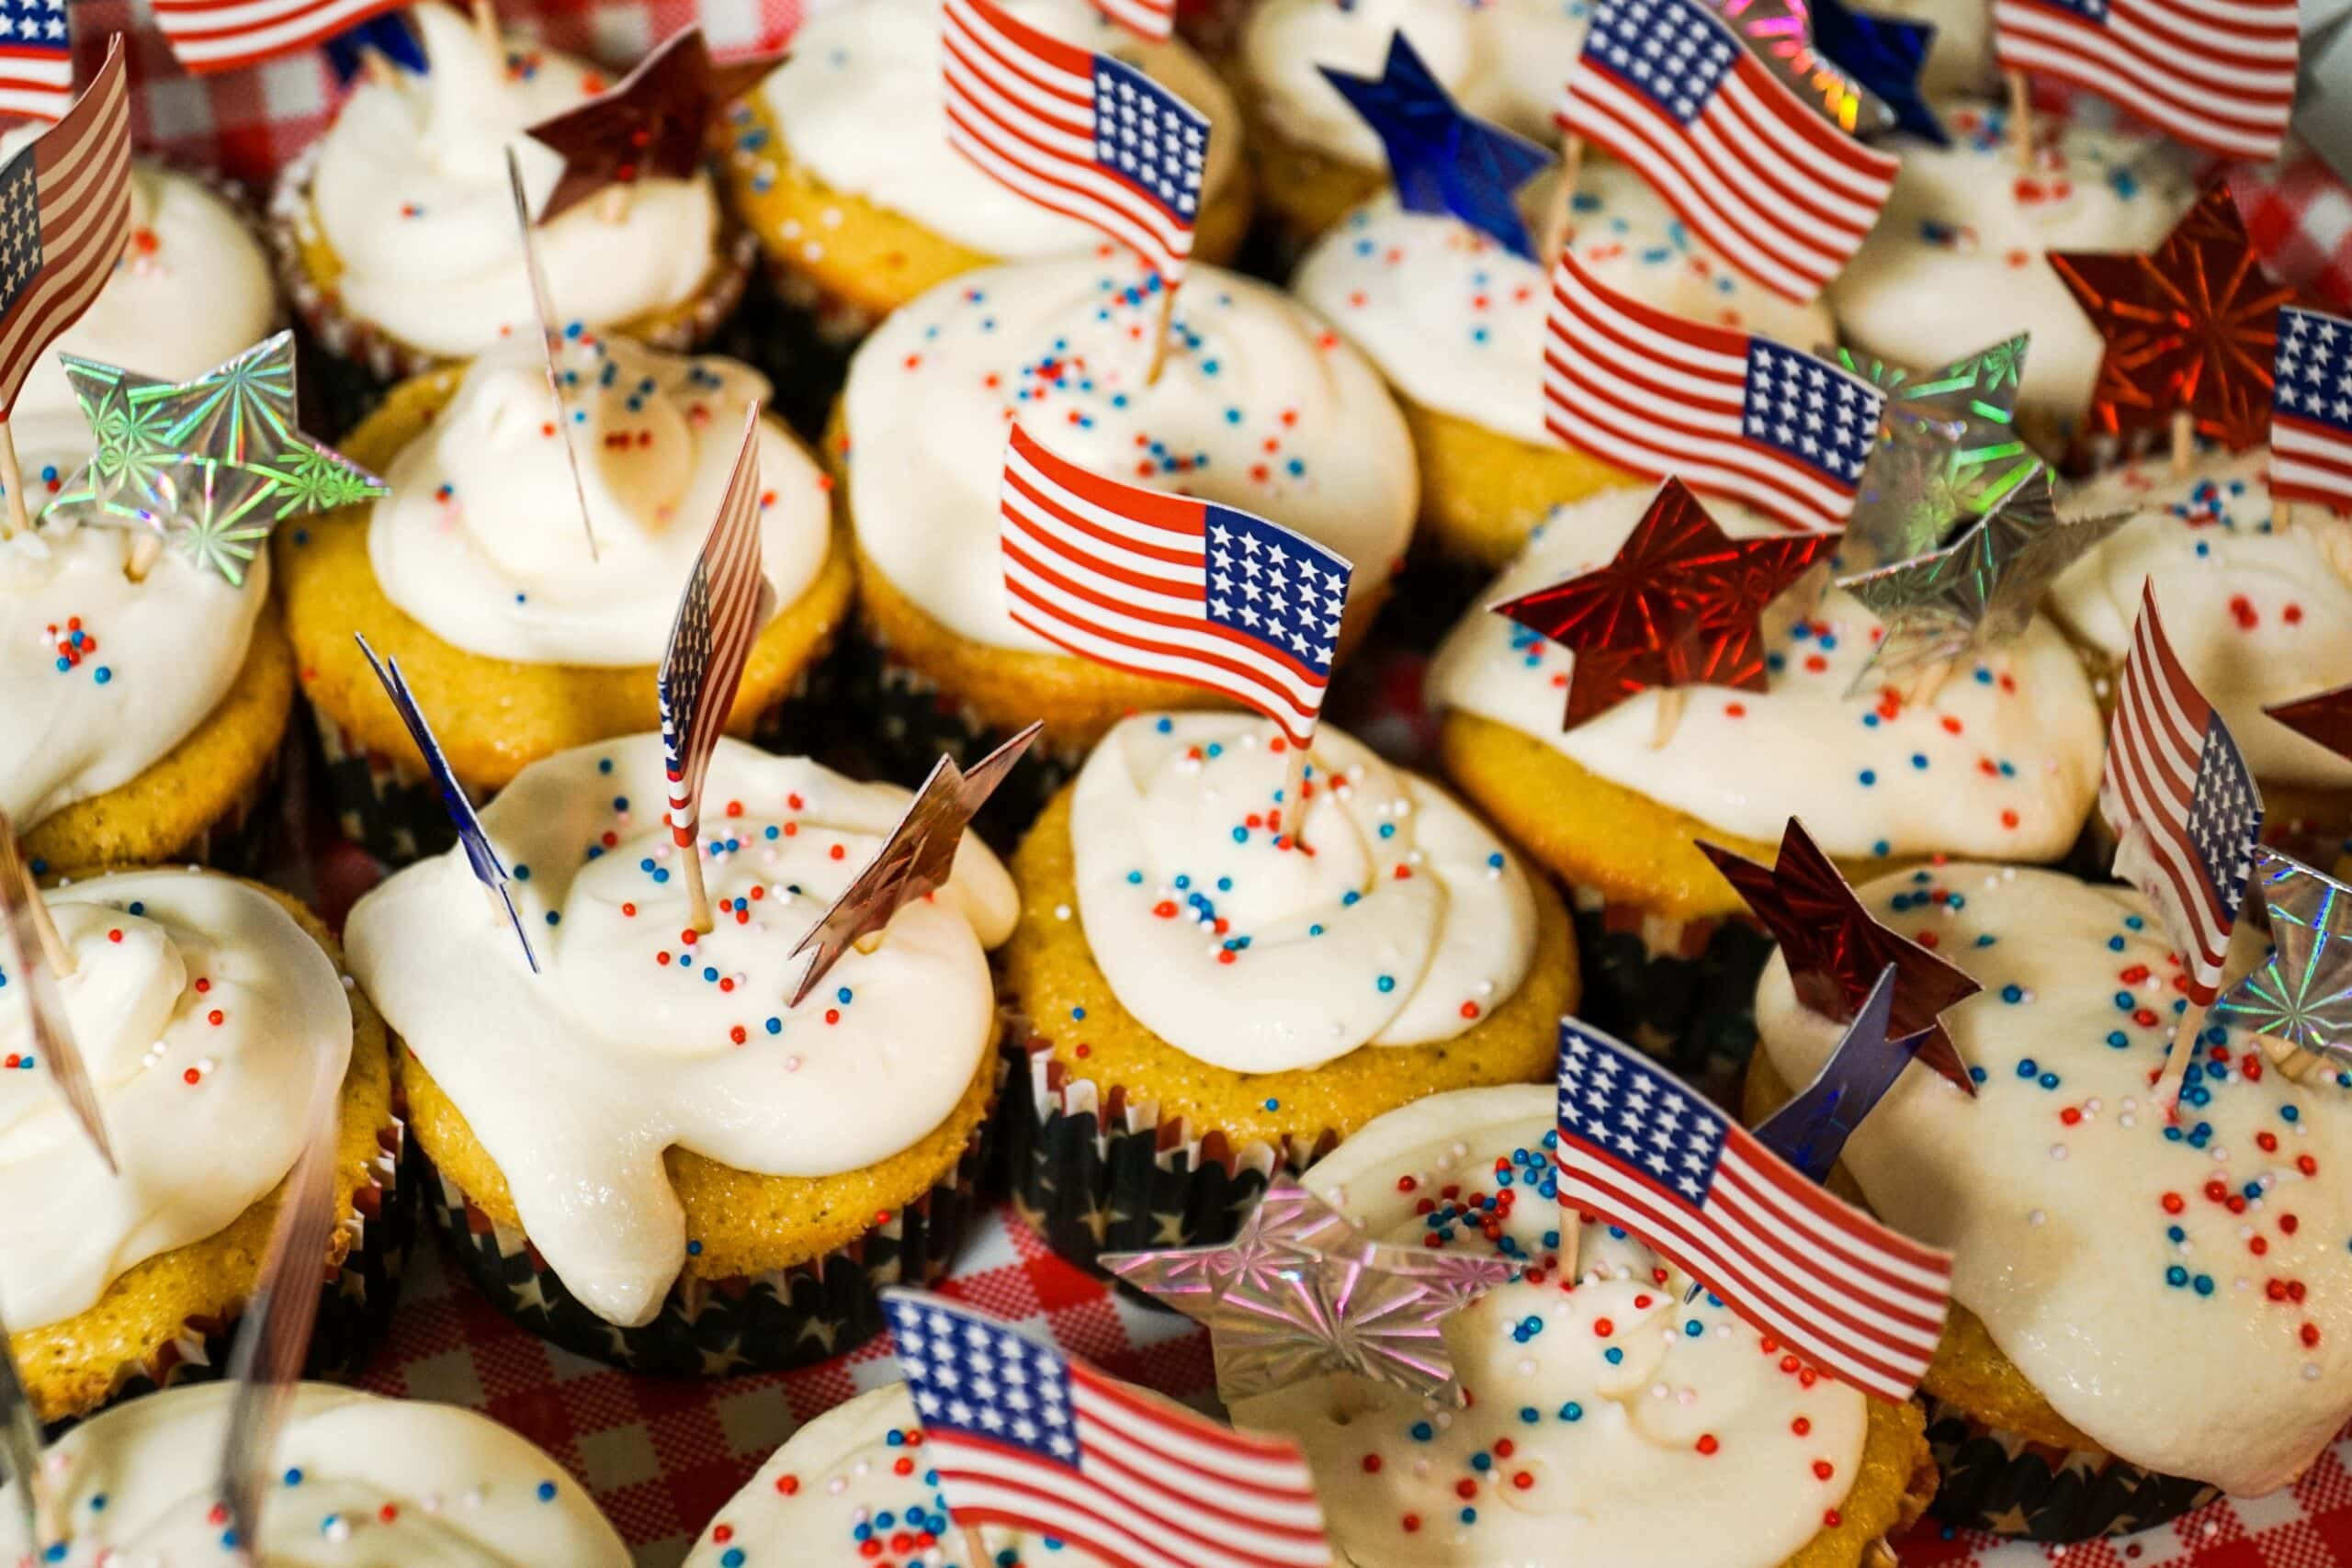 USA topped cakes